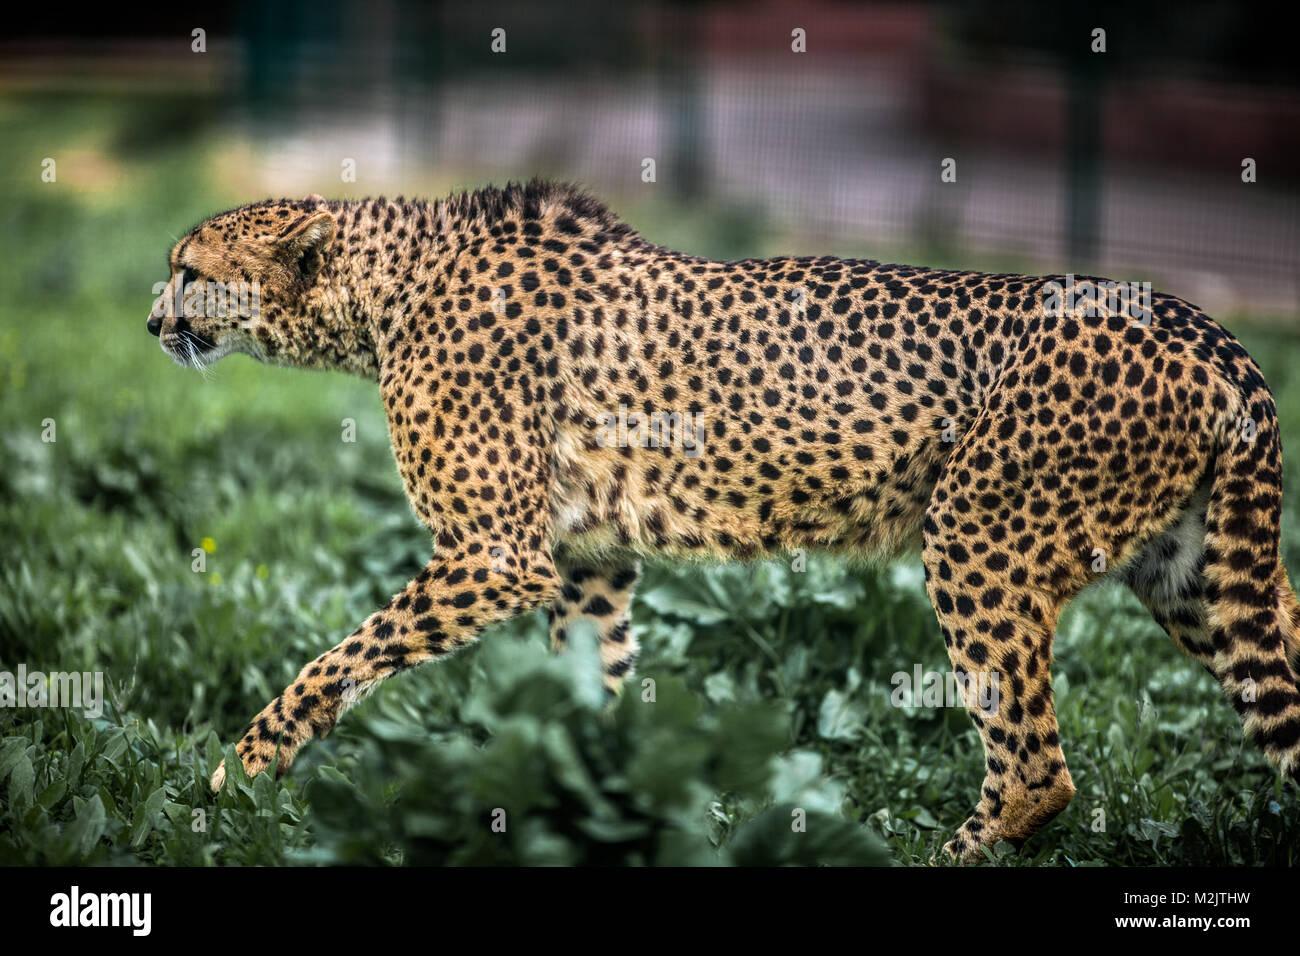 Bella Wild ghepardo attenta a piedi su campi verdi, Close up Immagini Stock